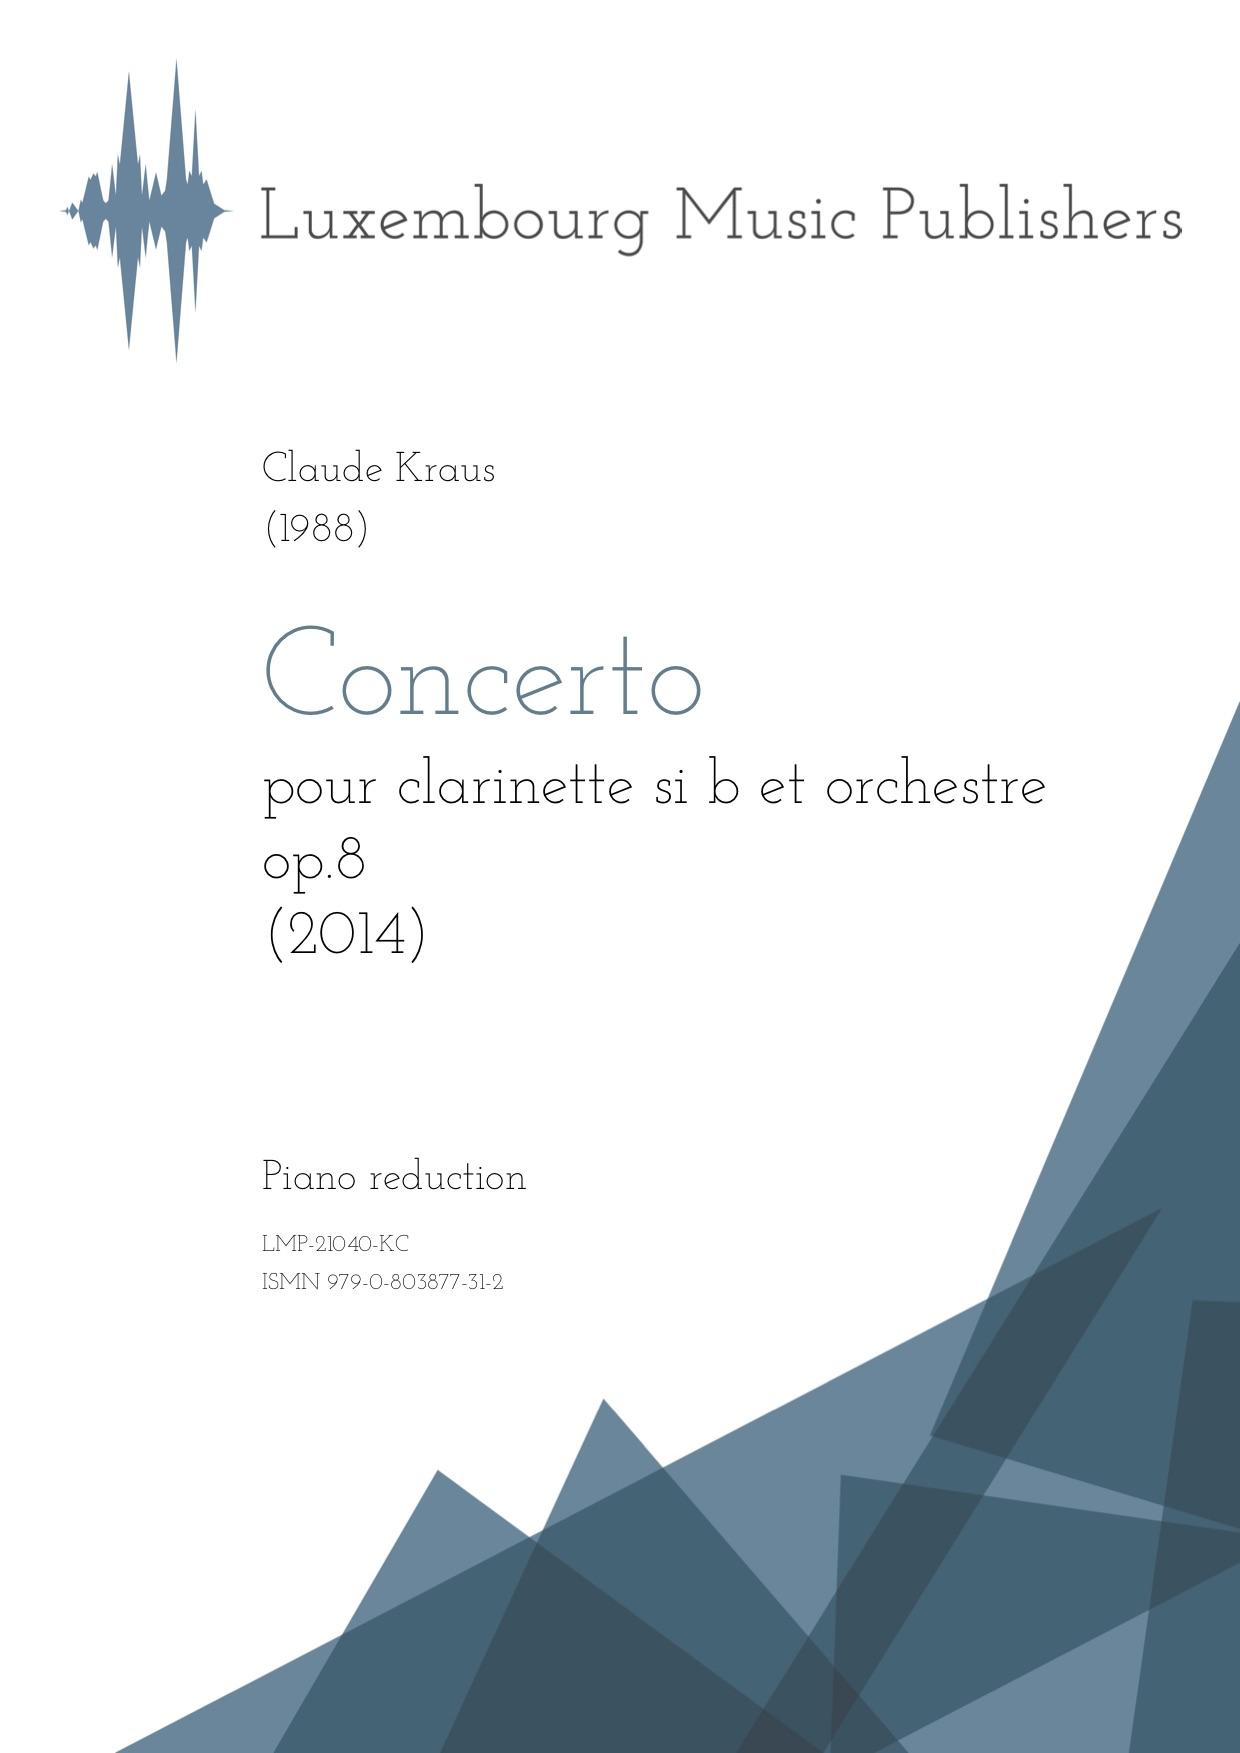 Concerto pour clarinette. Piano reduction